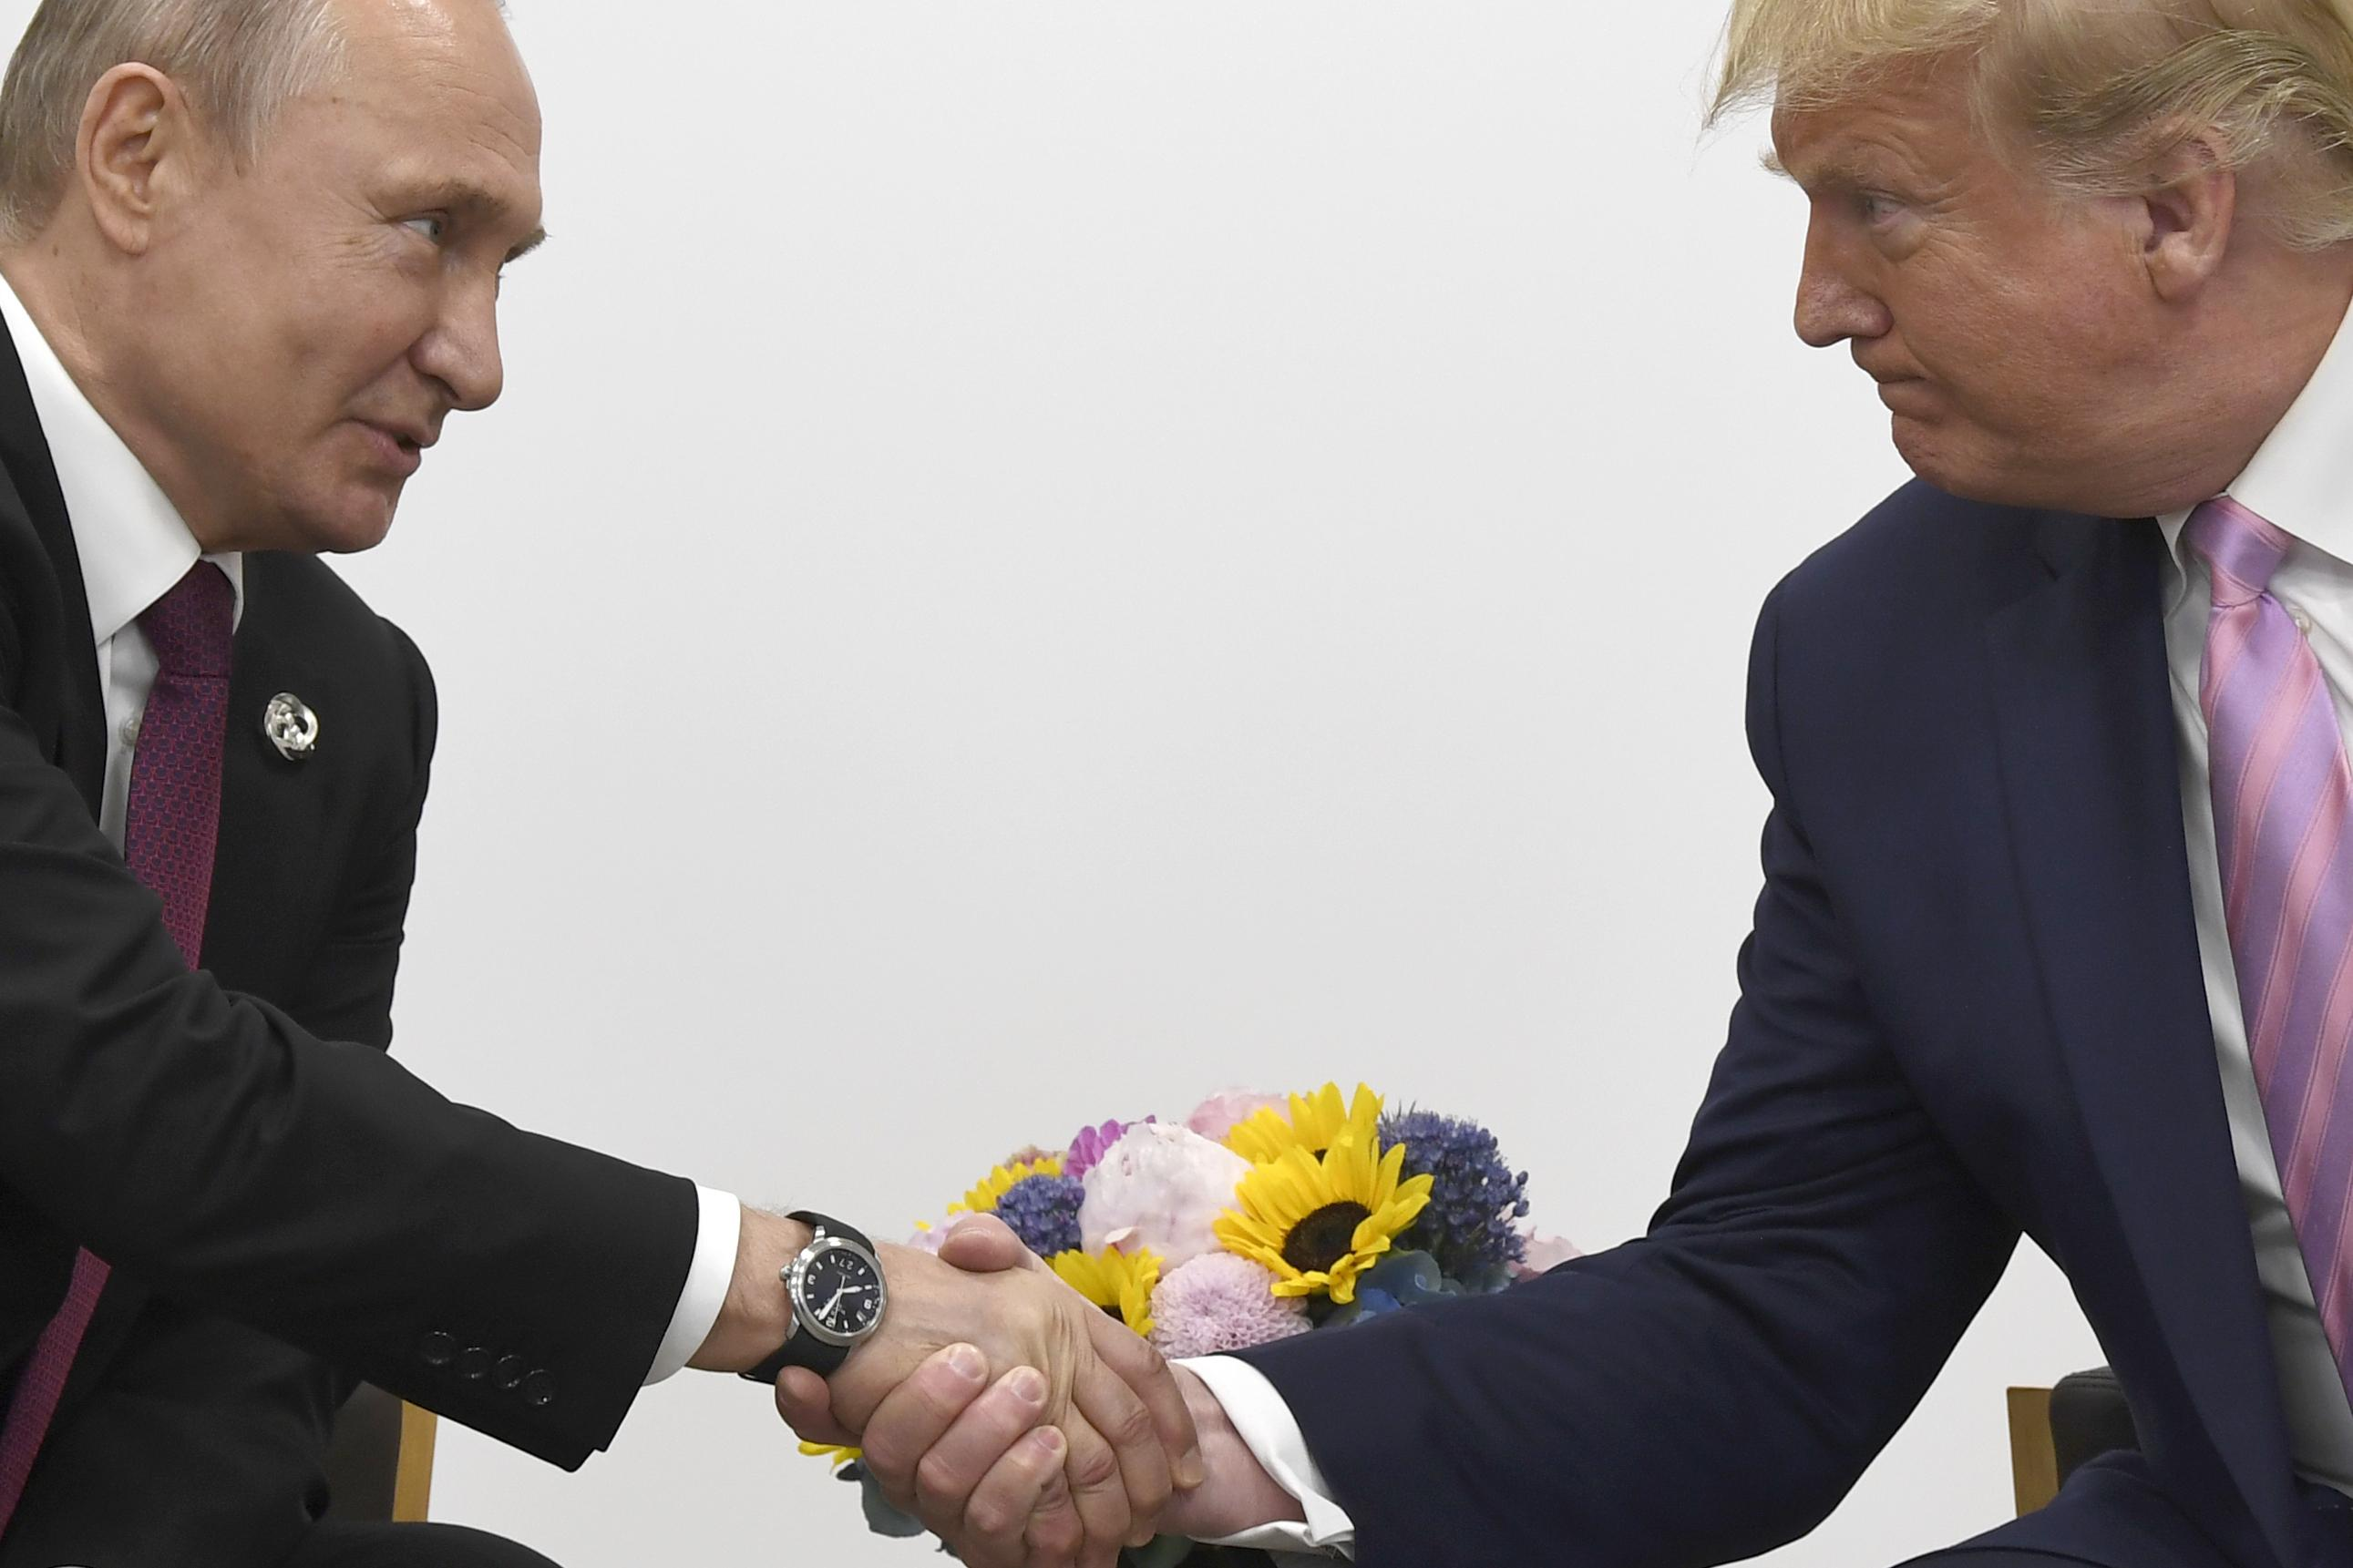 CROSSTALK: Why the G-7 is irrelevant